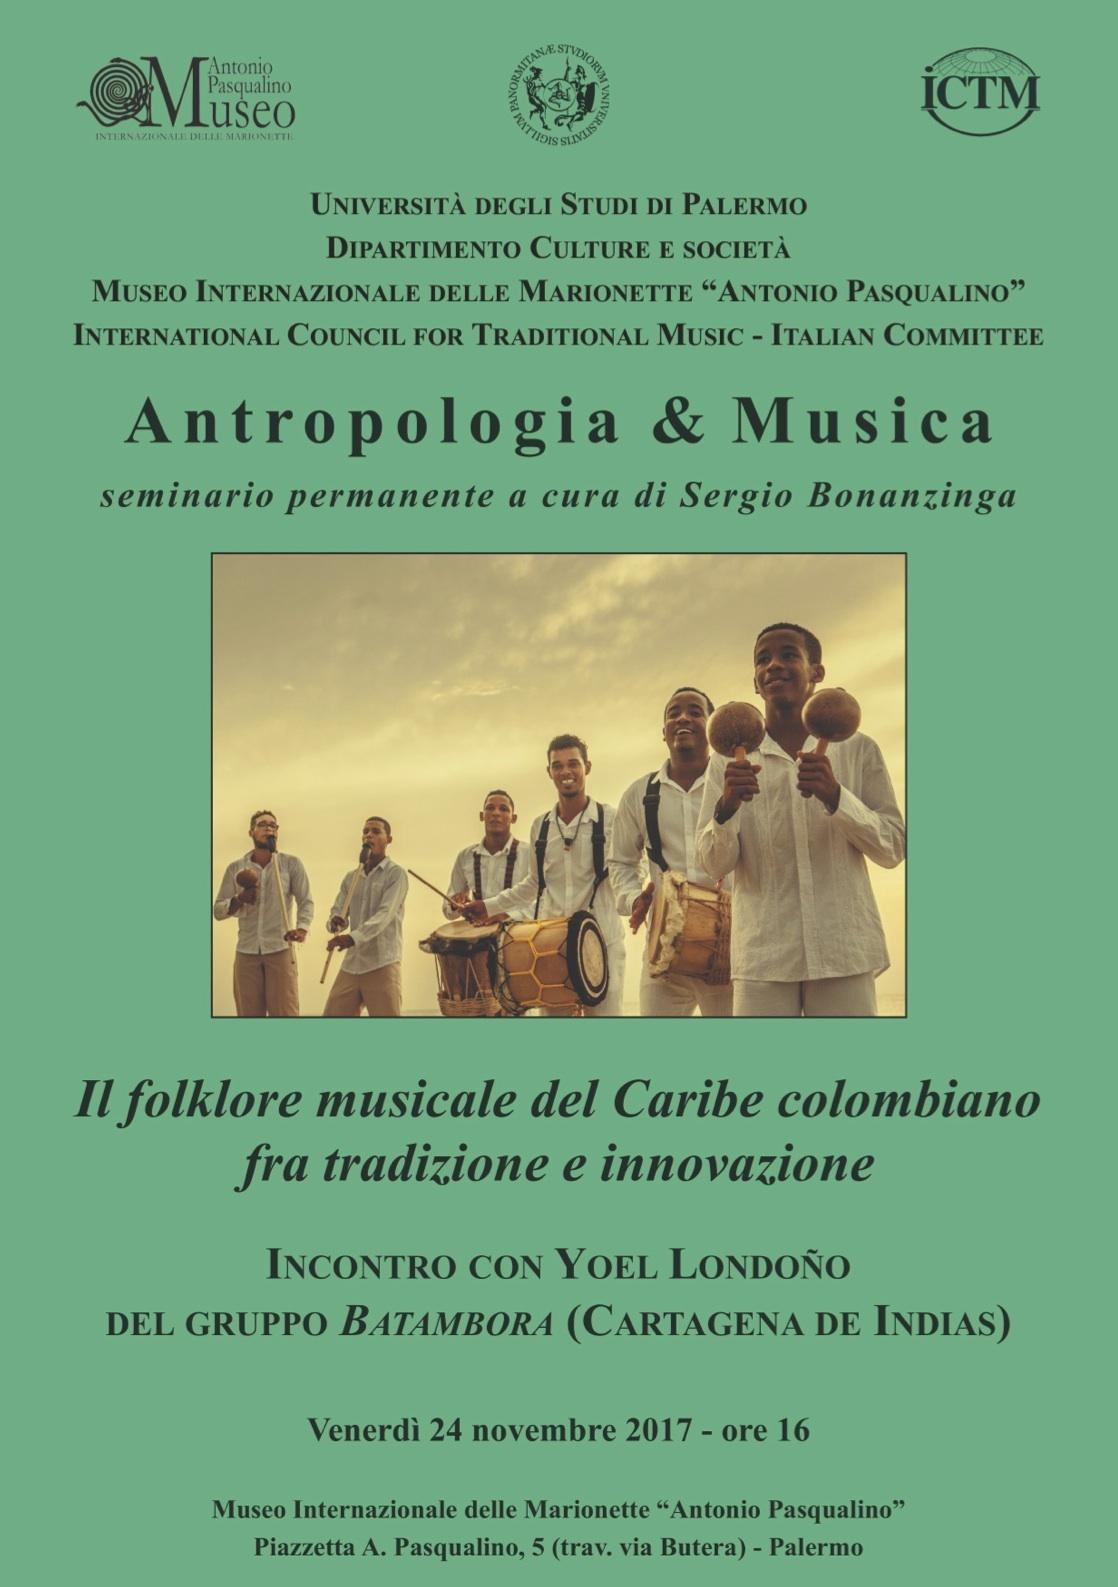 Antropologia_e_musica.jpg - 279.88 kB